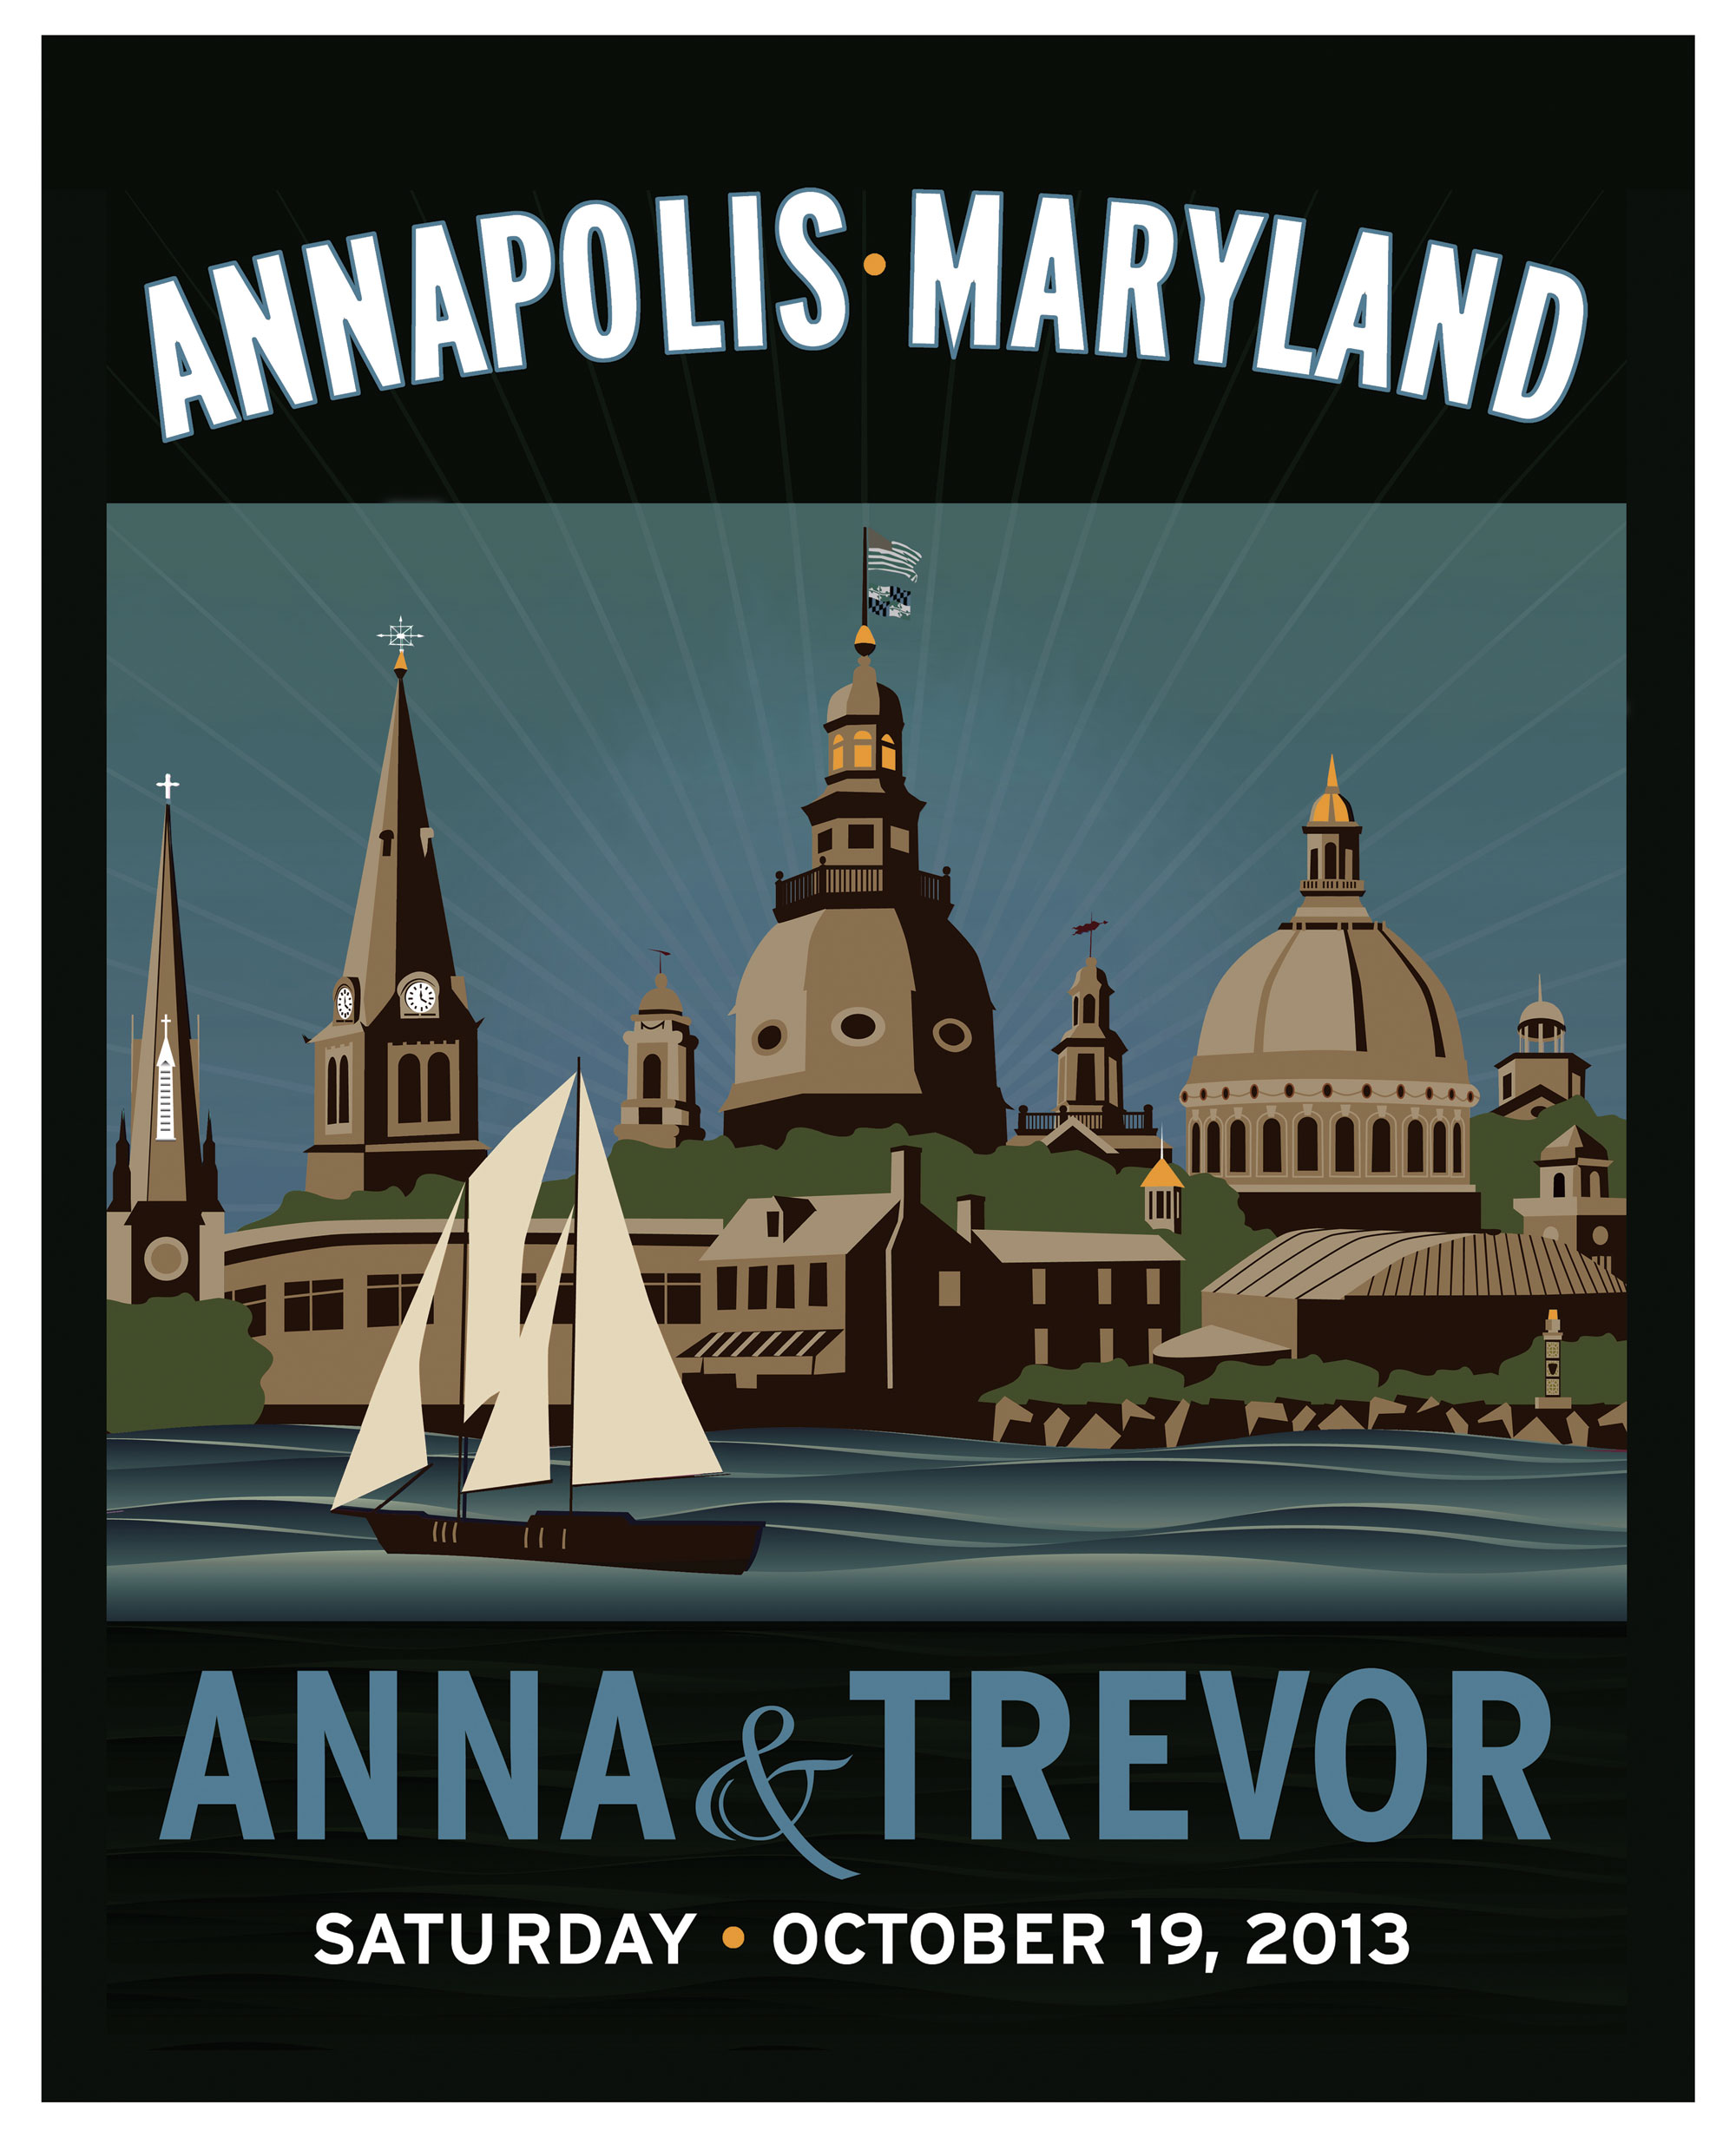 Annapolis Wedding Announcement for Ann and Trevor.